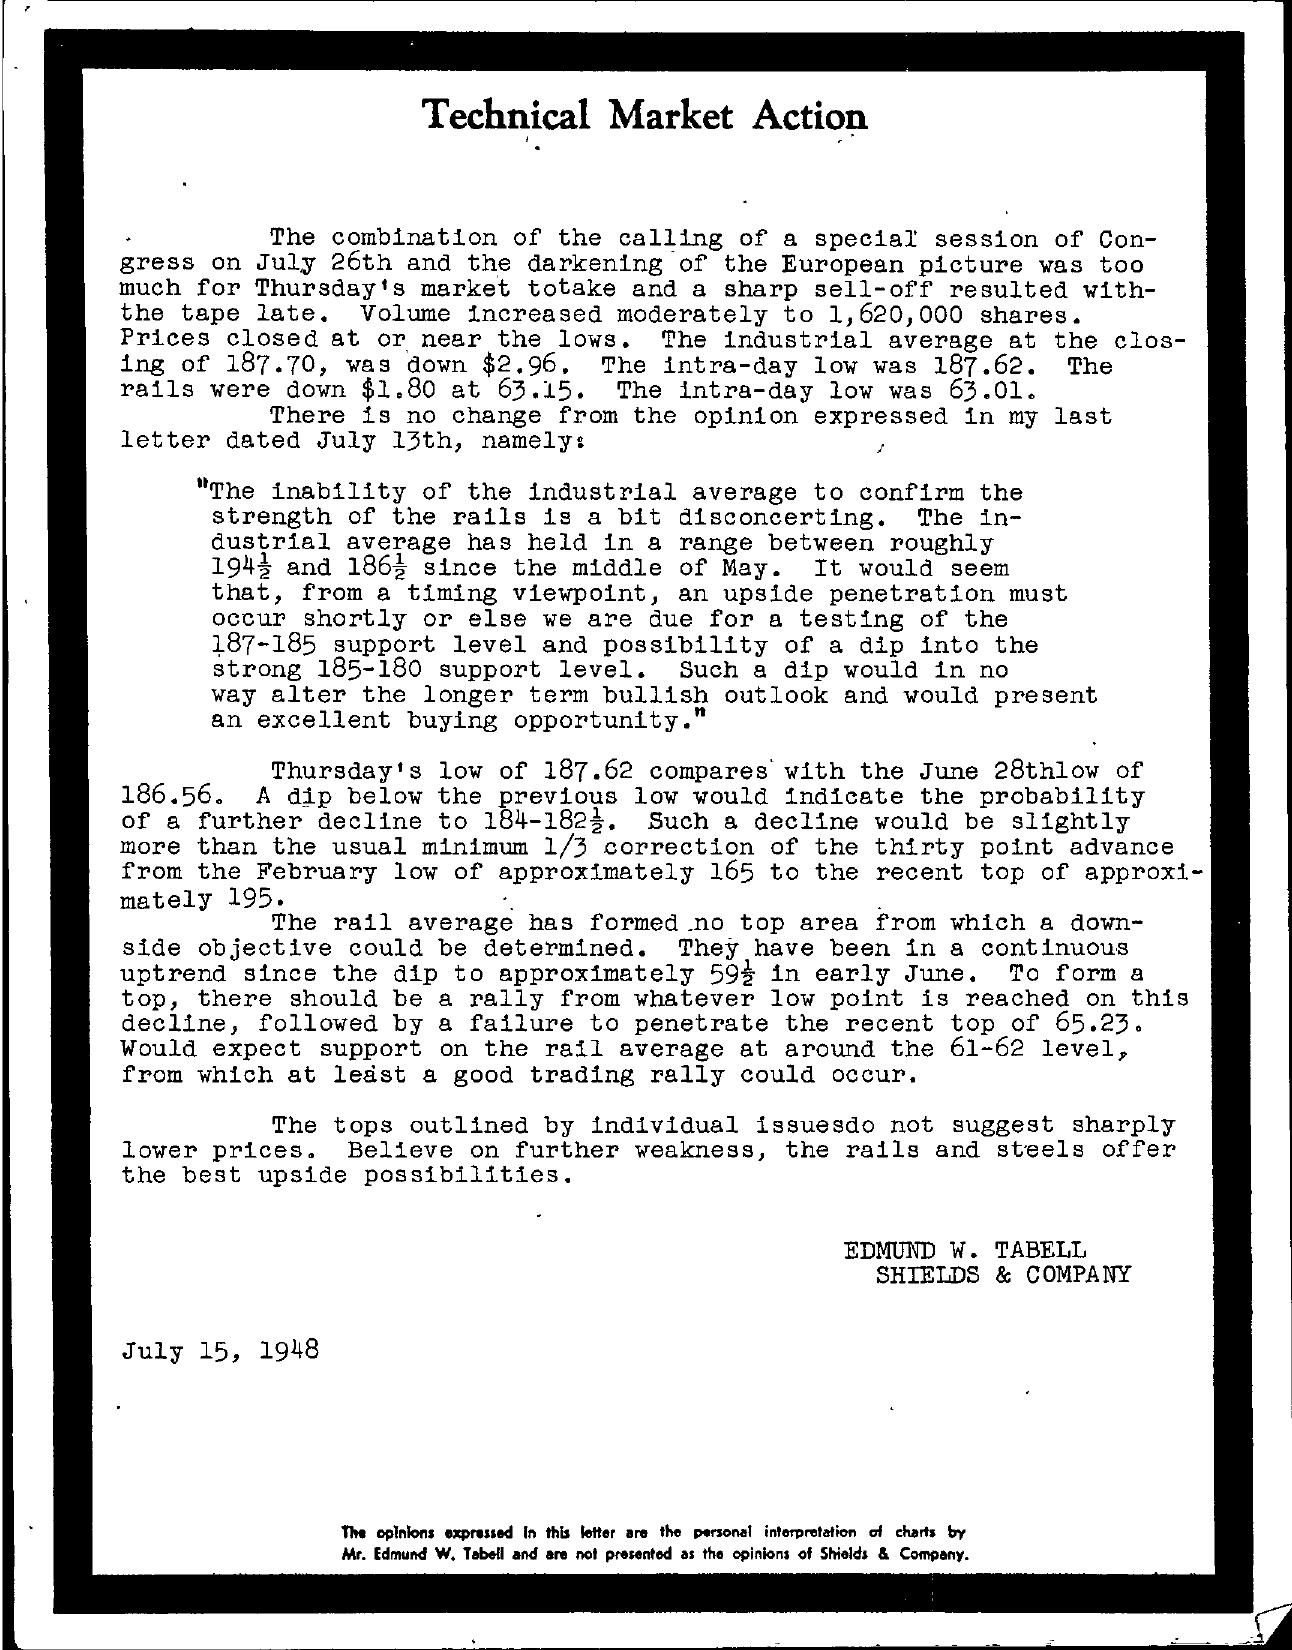 Tabell's Market Letter - July 15, 1948